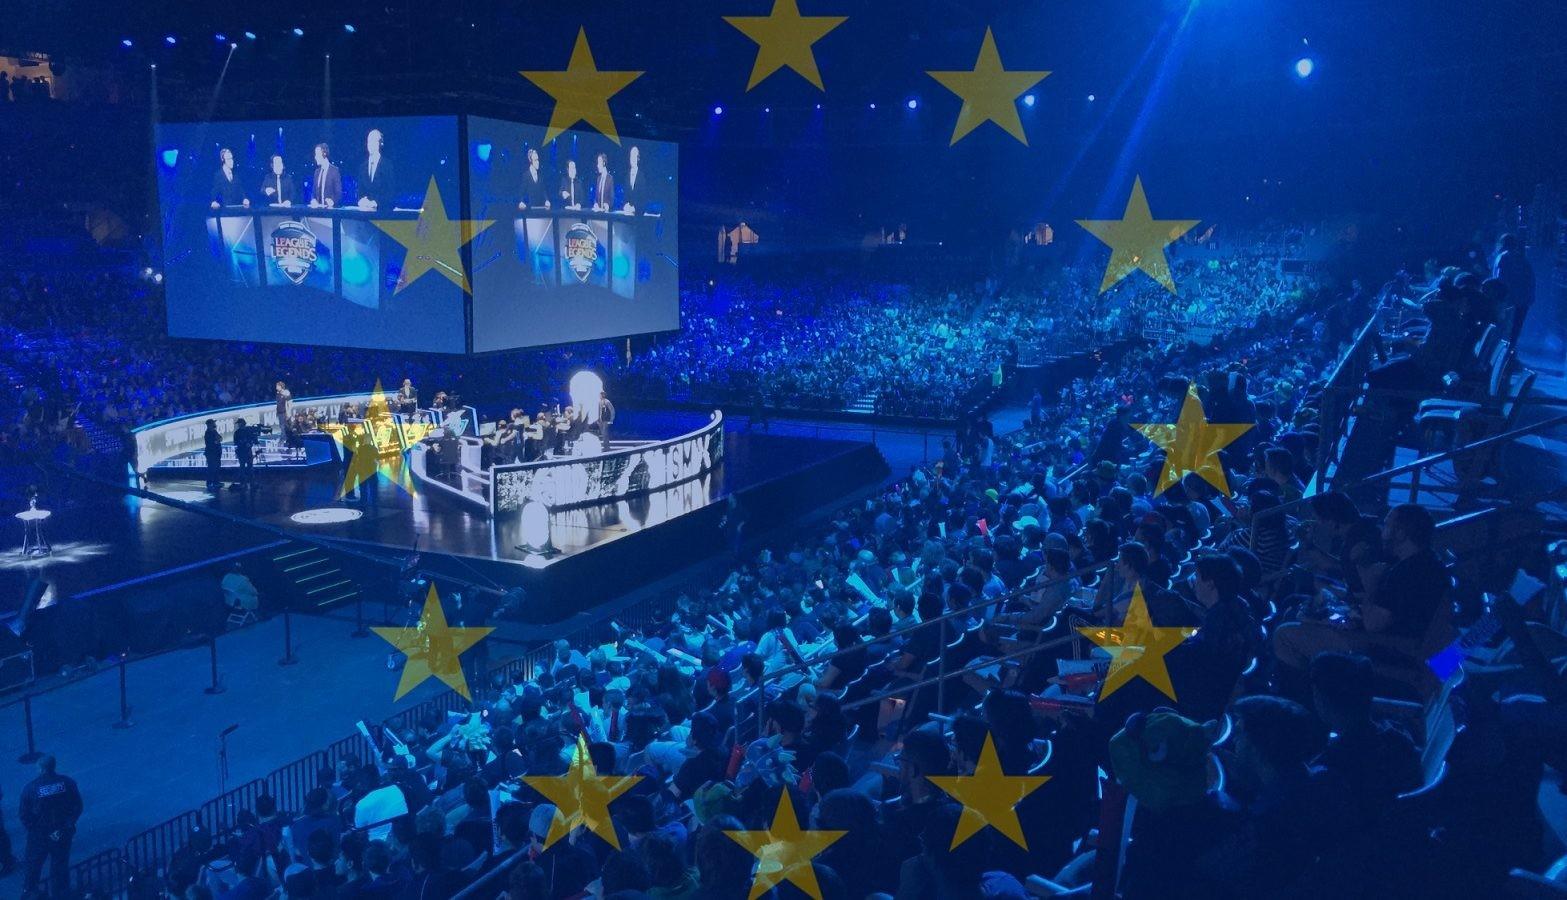 Lcs europa